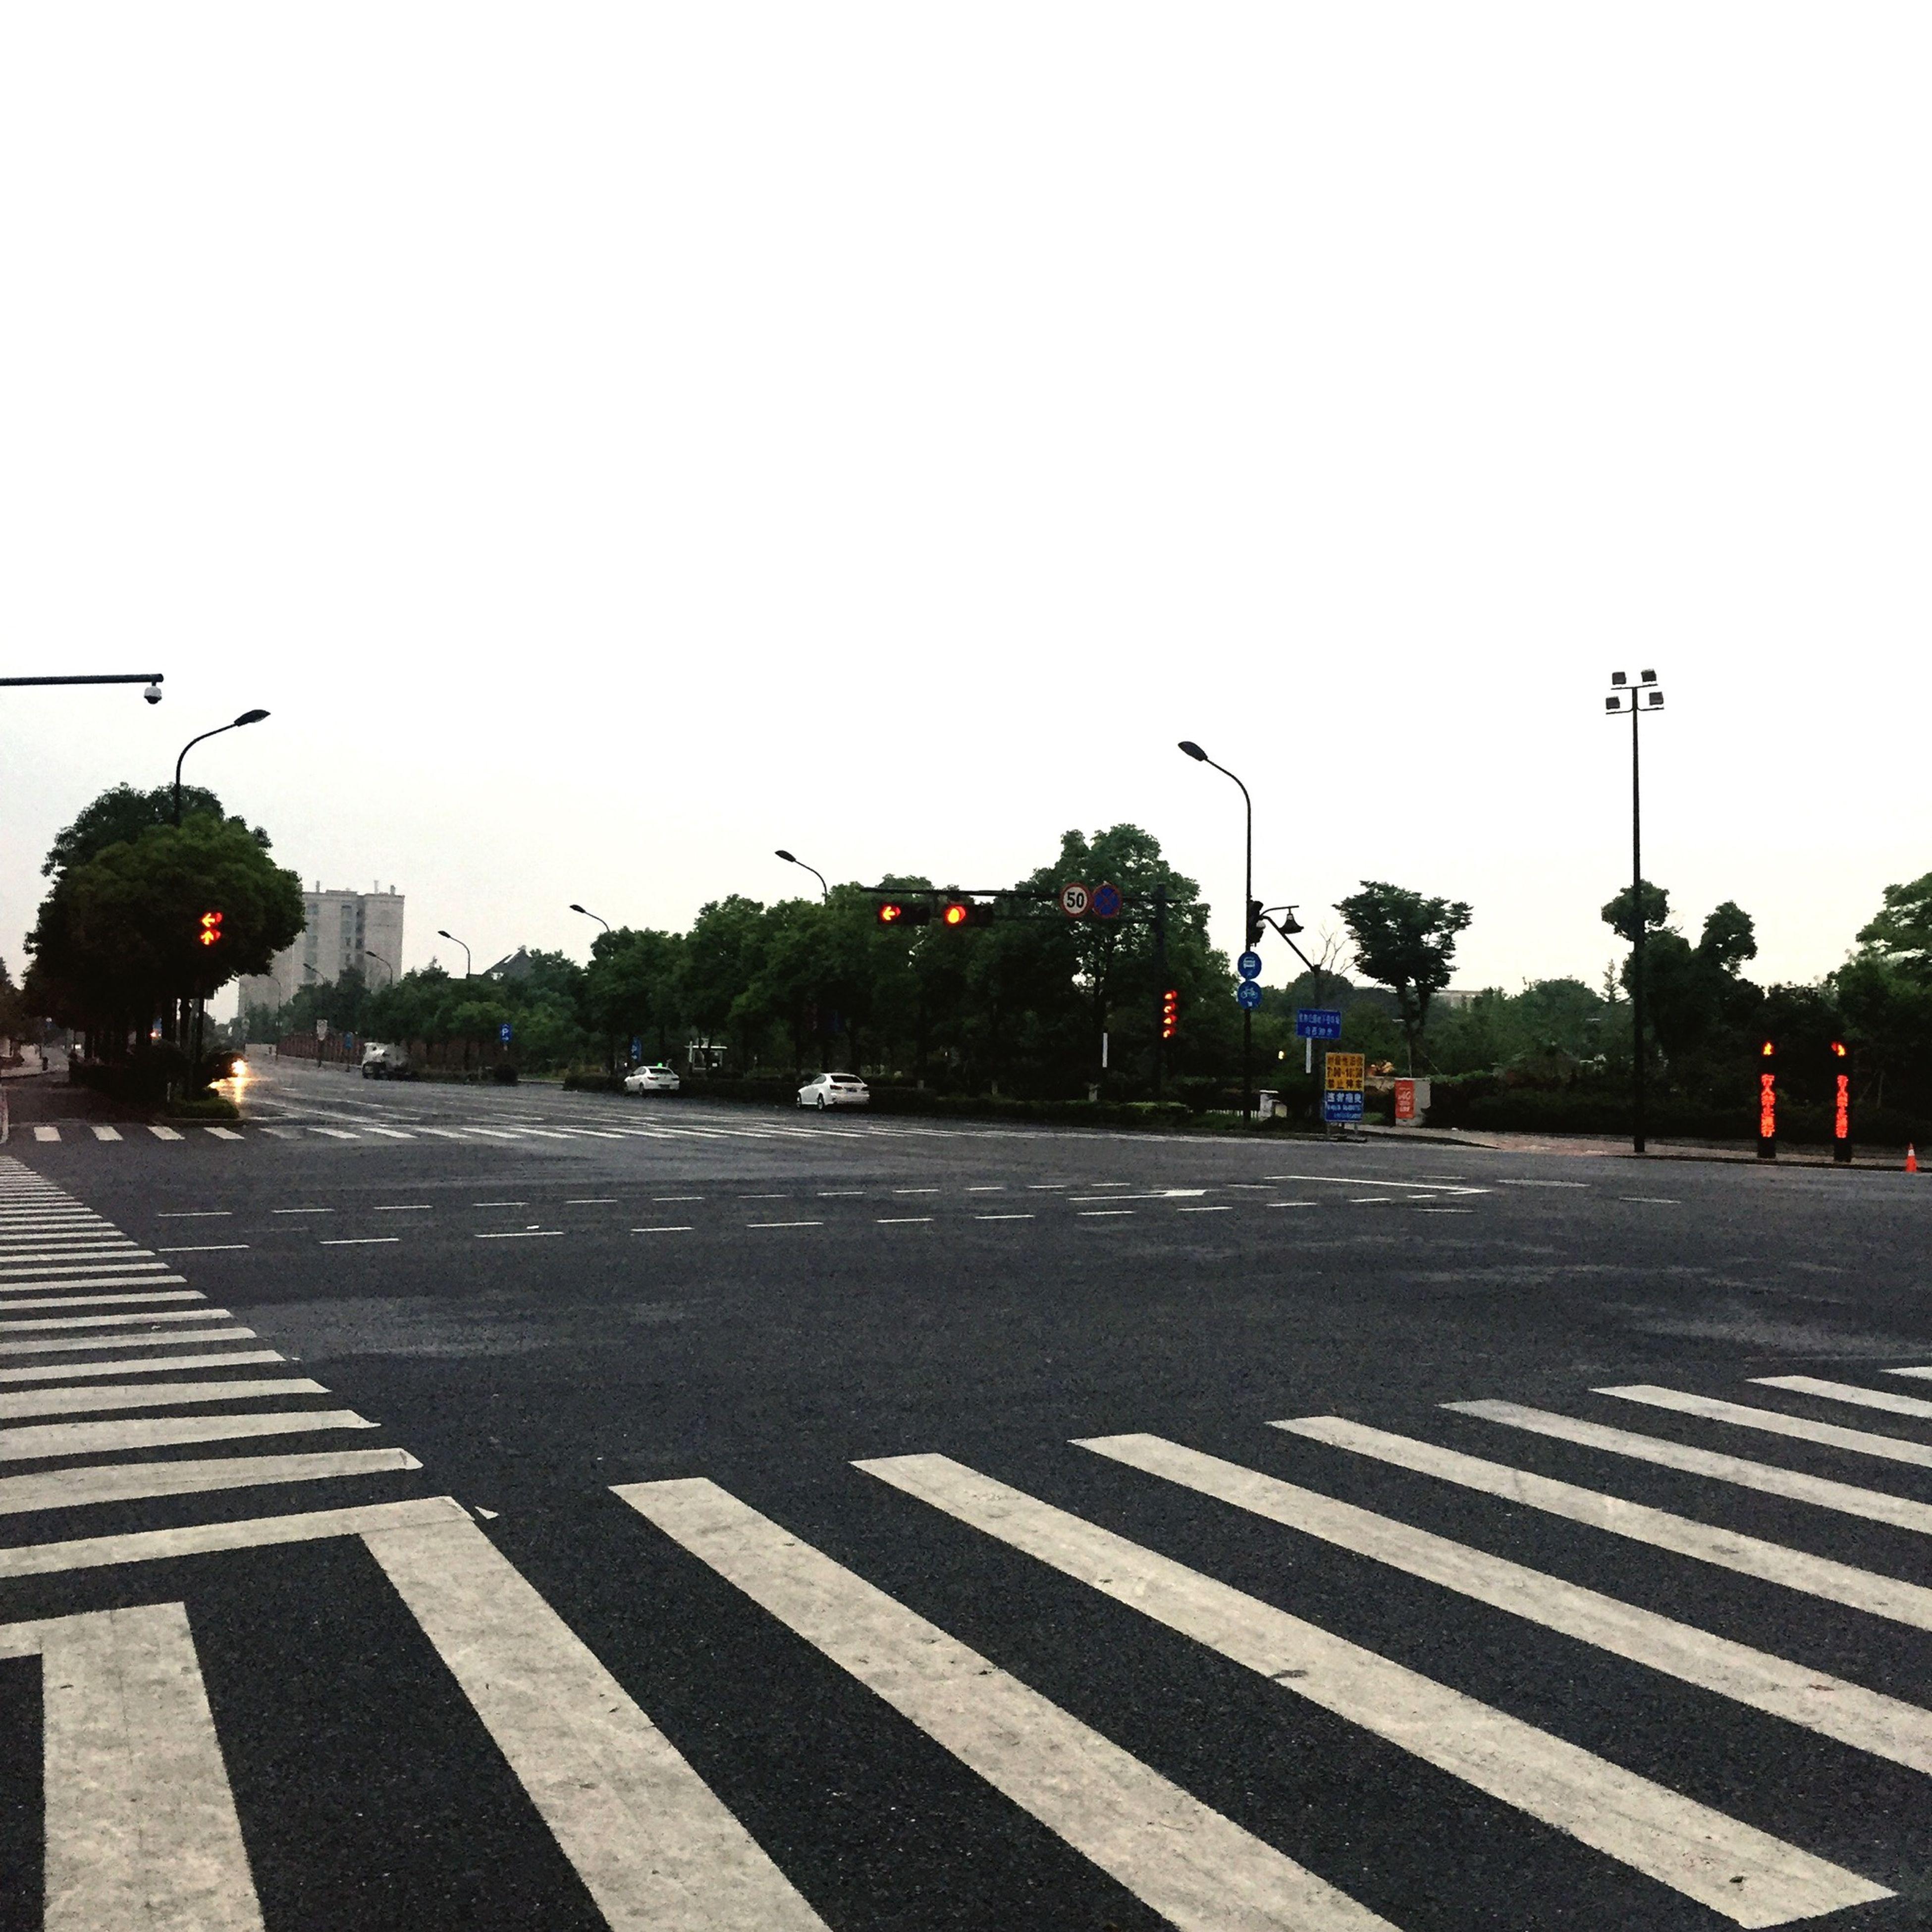 road marking, transportation, road, street, clear sky, car, the way forward, street light, land vehicle, road sign, mode of transport, city, zebra crossing, building exterior, city street, asphalt, arrow symbol, guidance, tree, built structure